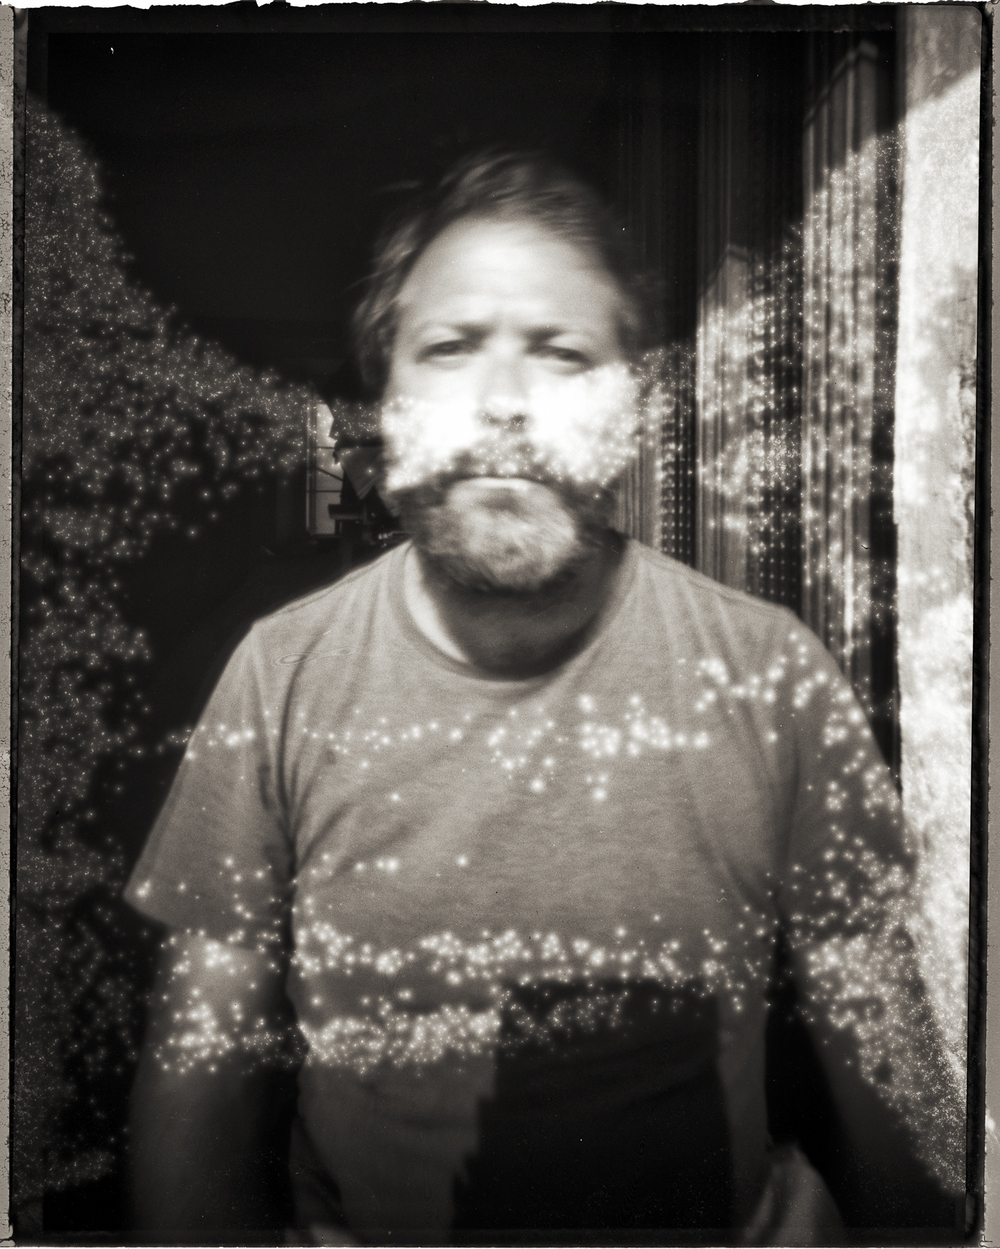 Davide Ferrari | Glitters | Noon Pinhole 4x5 | Polaroid 665